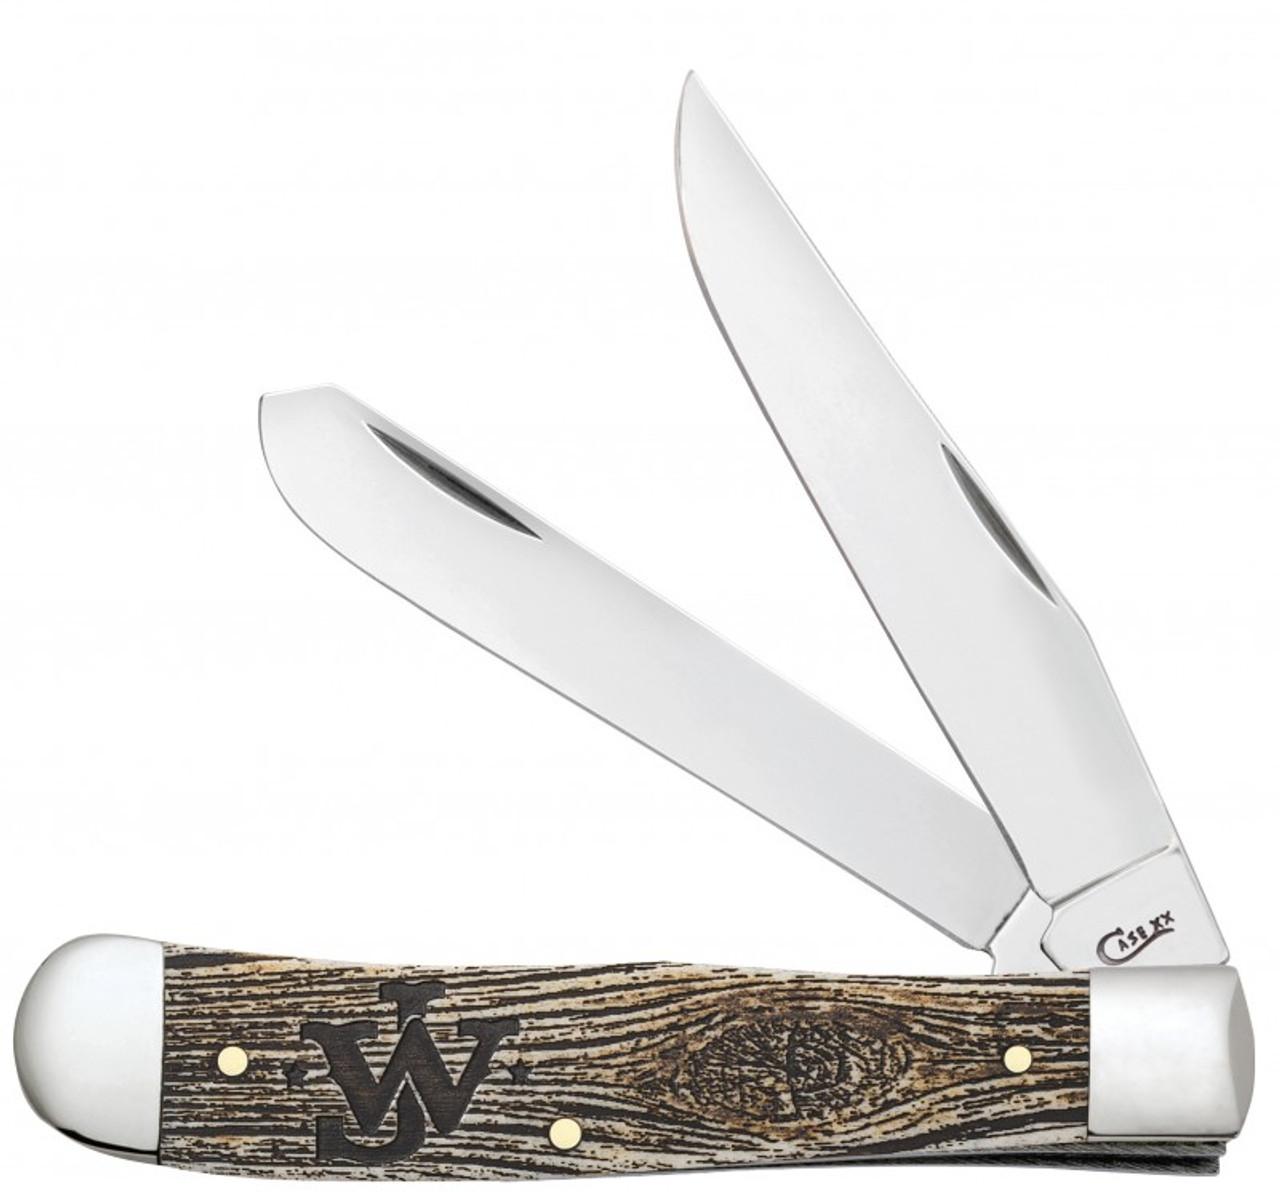 Case John Wayne Trapper 10705, Tru-Sharp SS Blade, Natural Bone with Amber Color Wash Handle